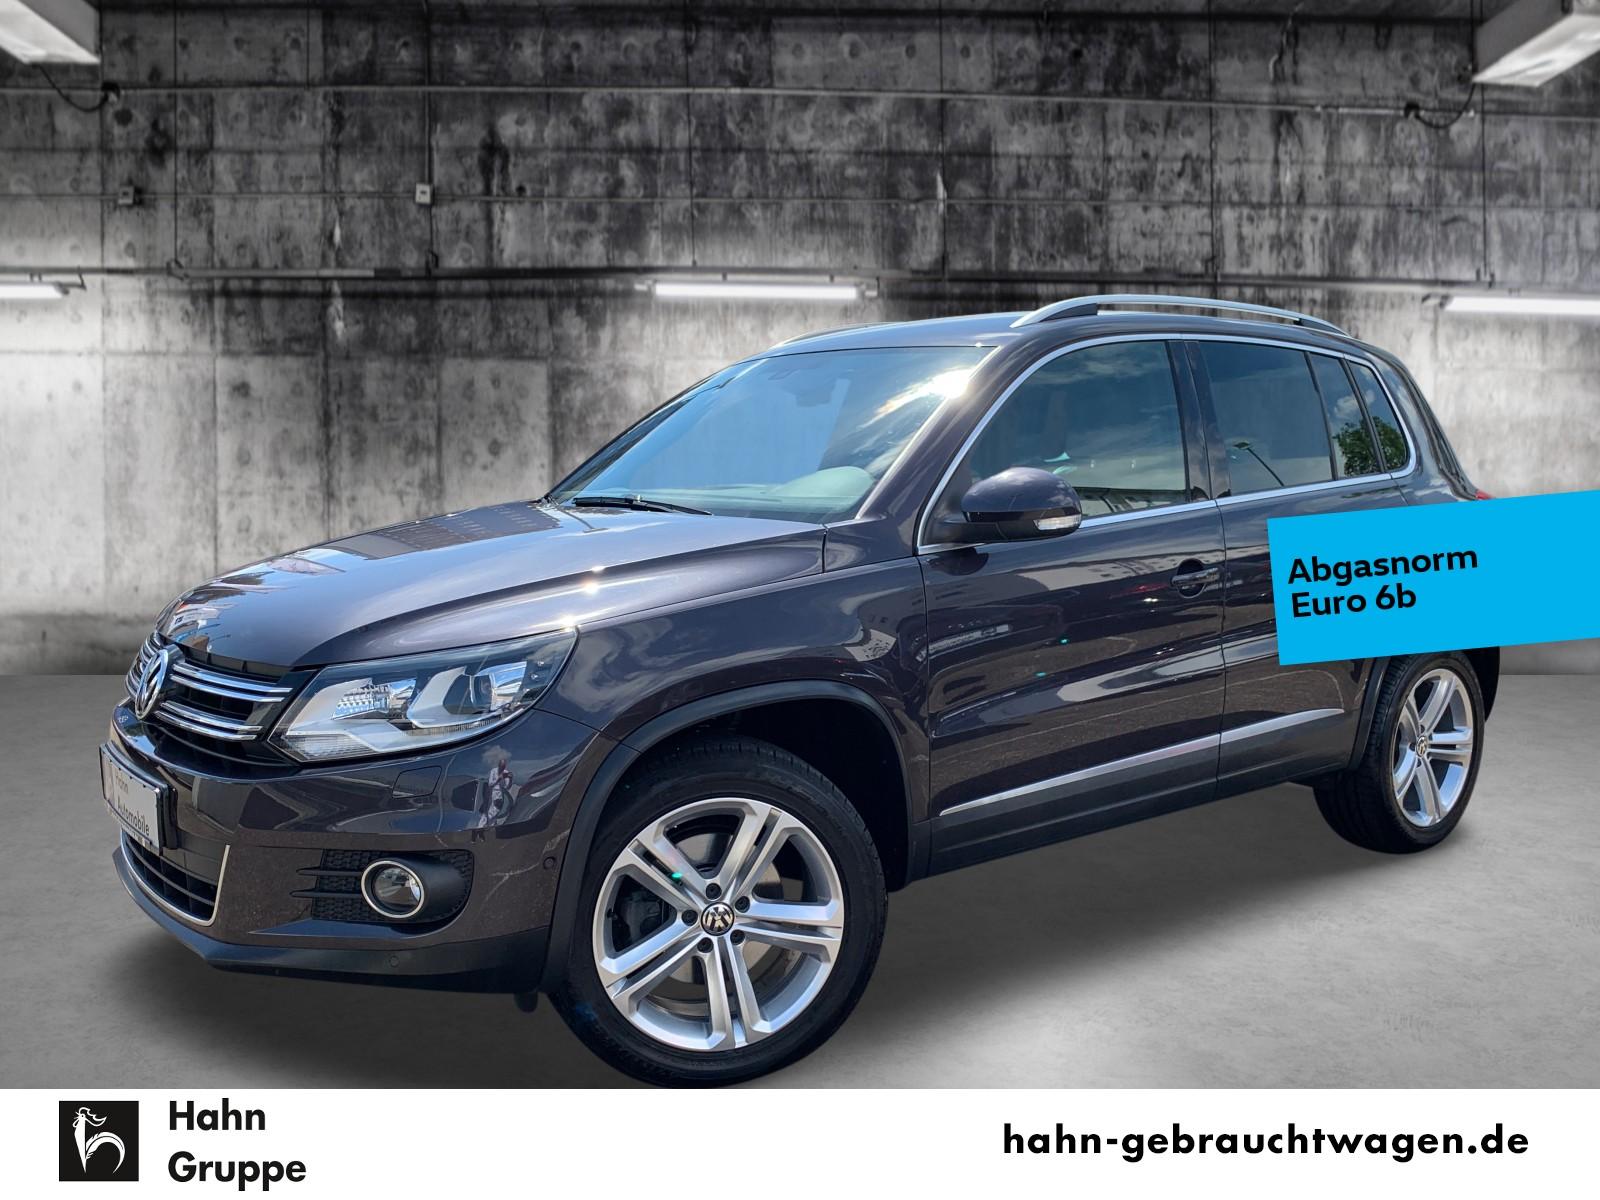 Volkswagen Tiguan LOUNGE 1,4TSI Navi Xenon Kamera Temp Park, Jahr 2016, Benzin